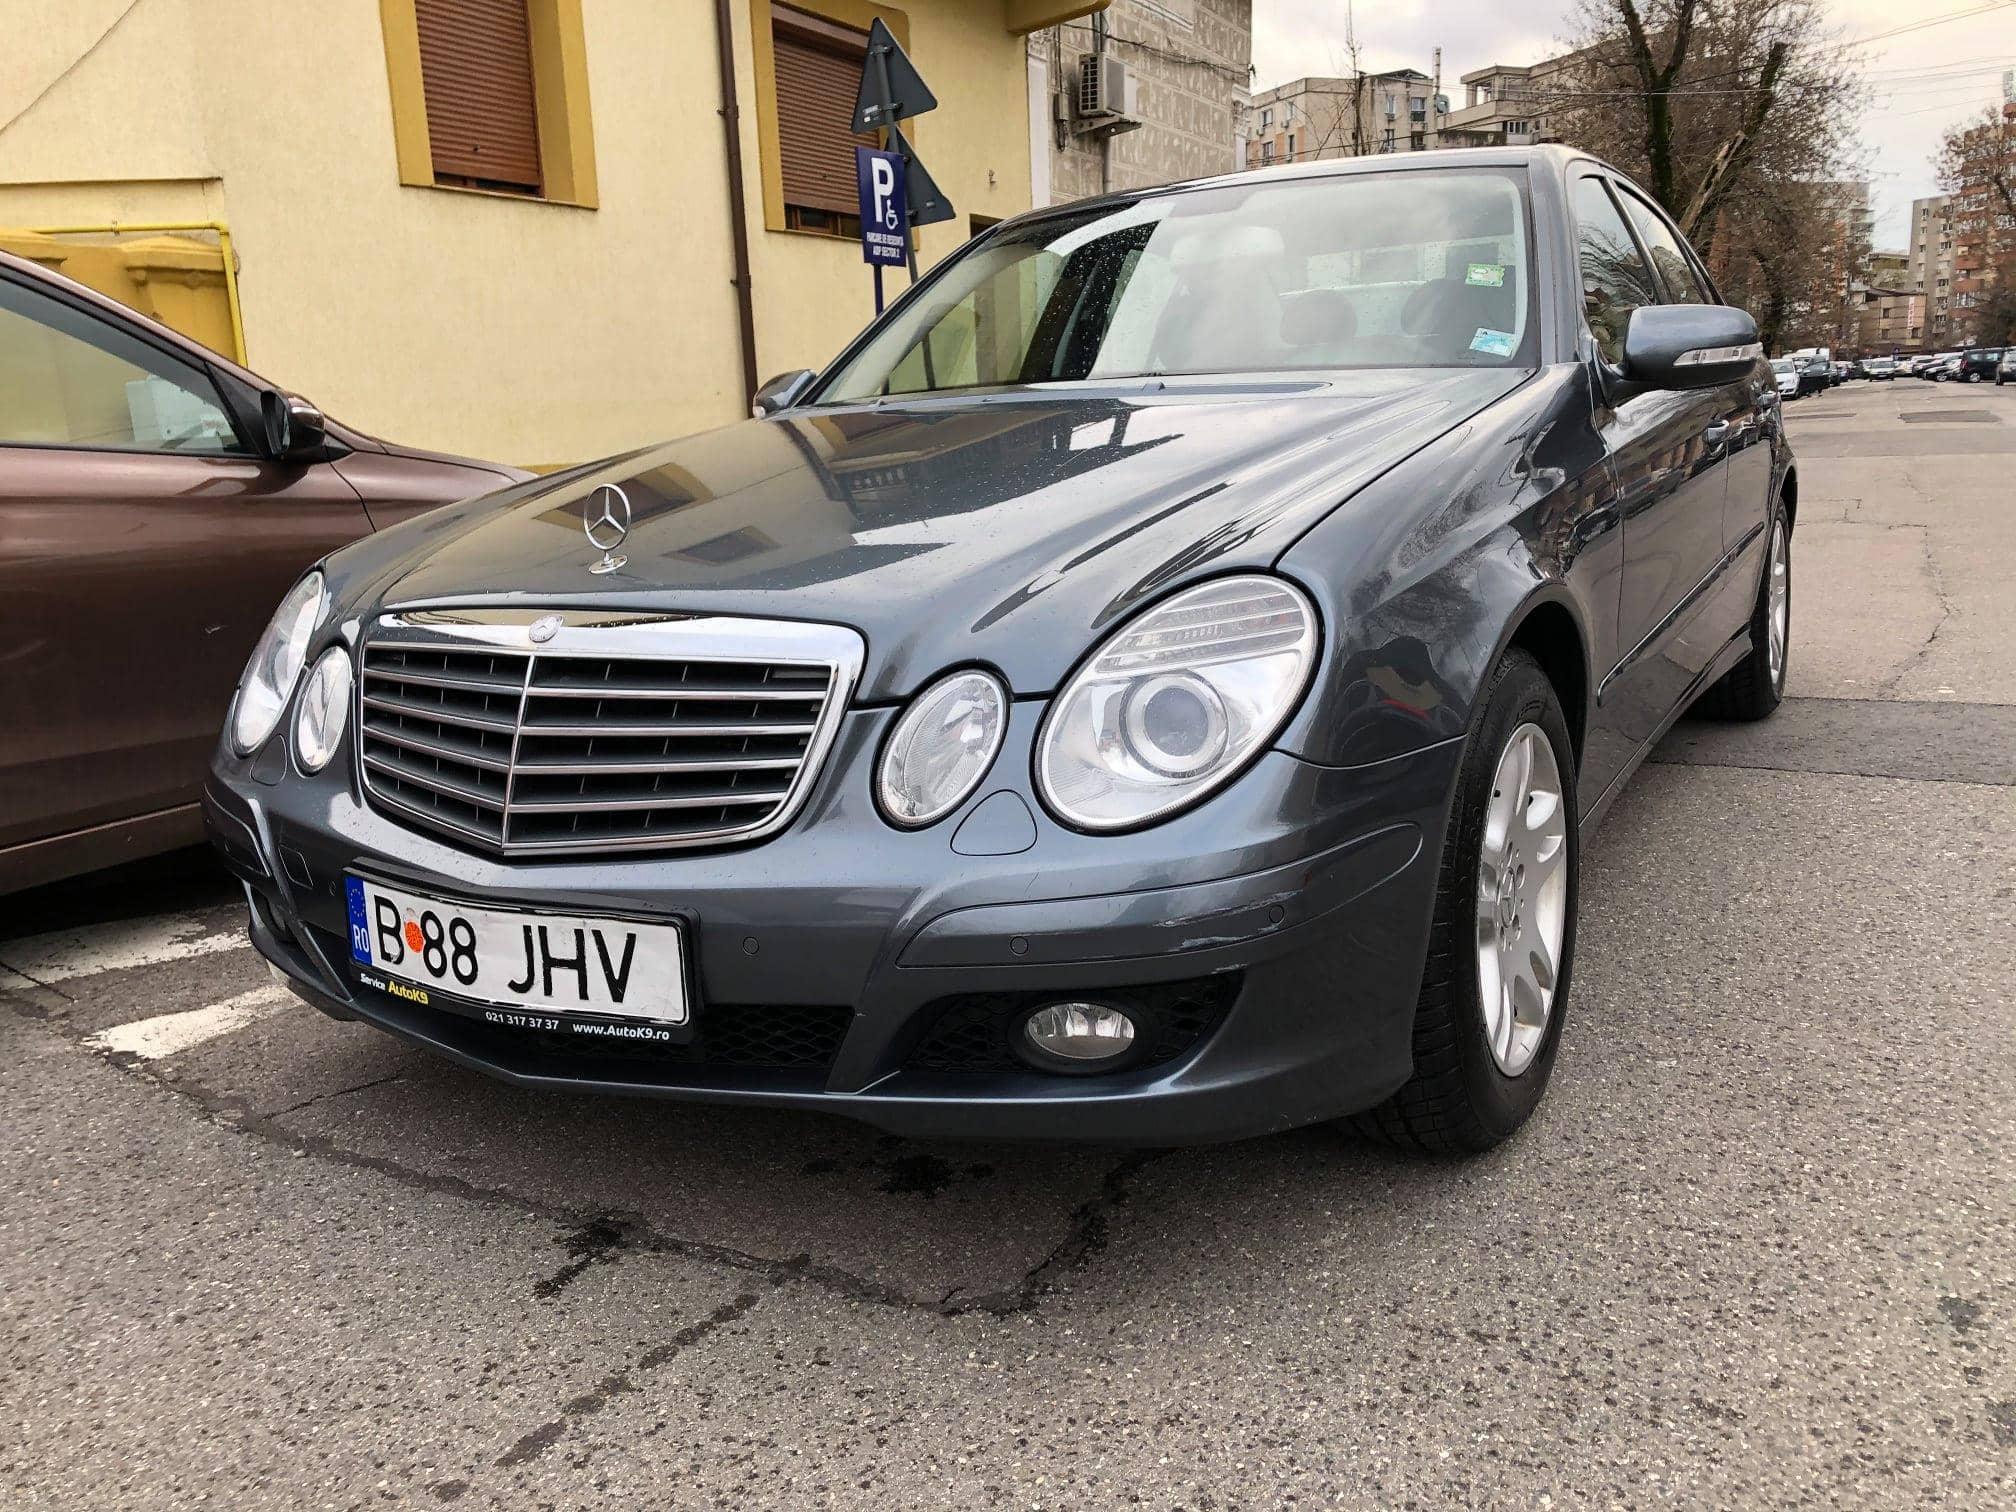 O altfel de verificare Mercedes w211 E220 cdi, 2008, automat, 136.000 km